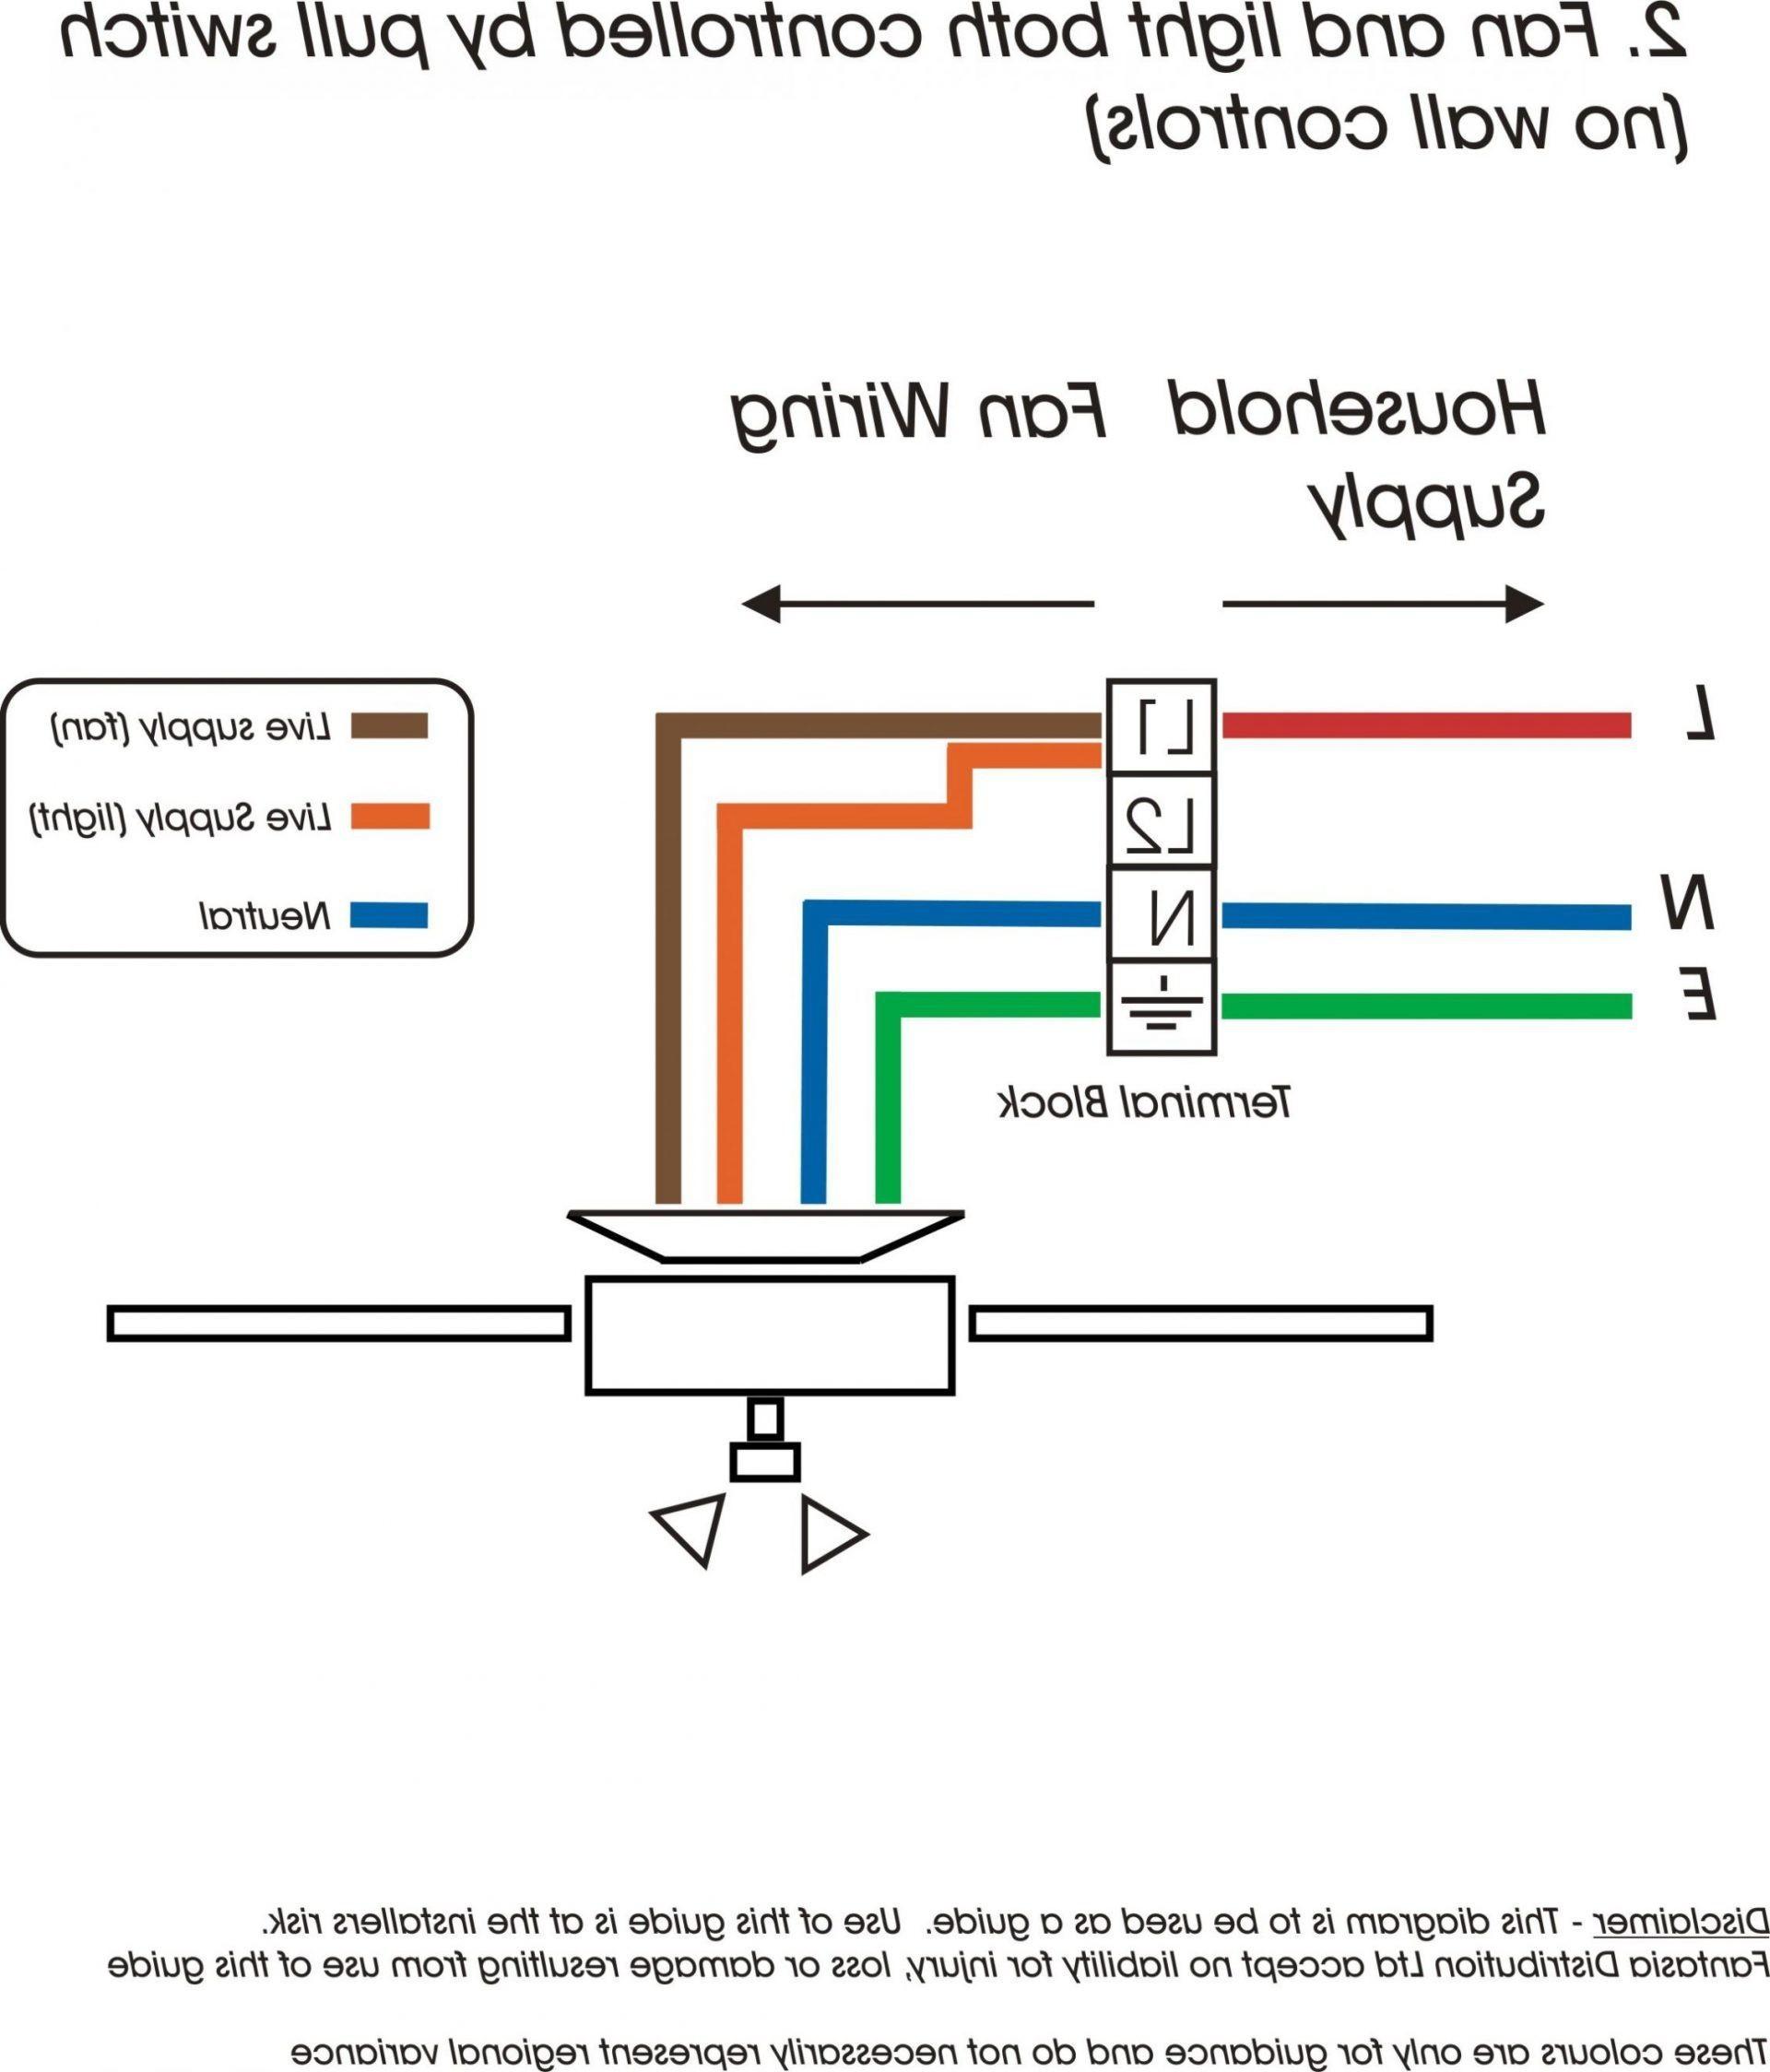 Hid Prox Reader Wiring Diagram Bmw 7 Hid Wiring Diag